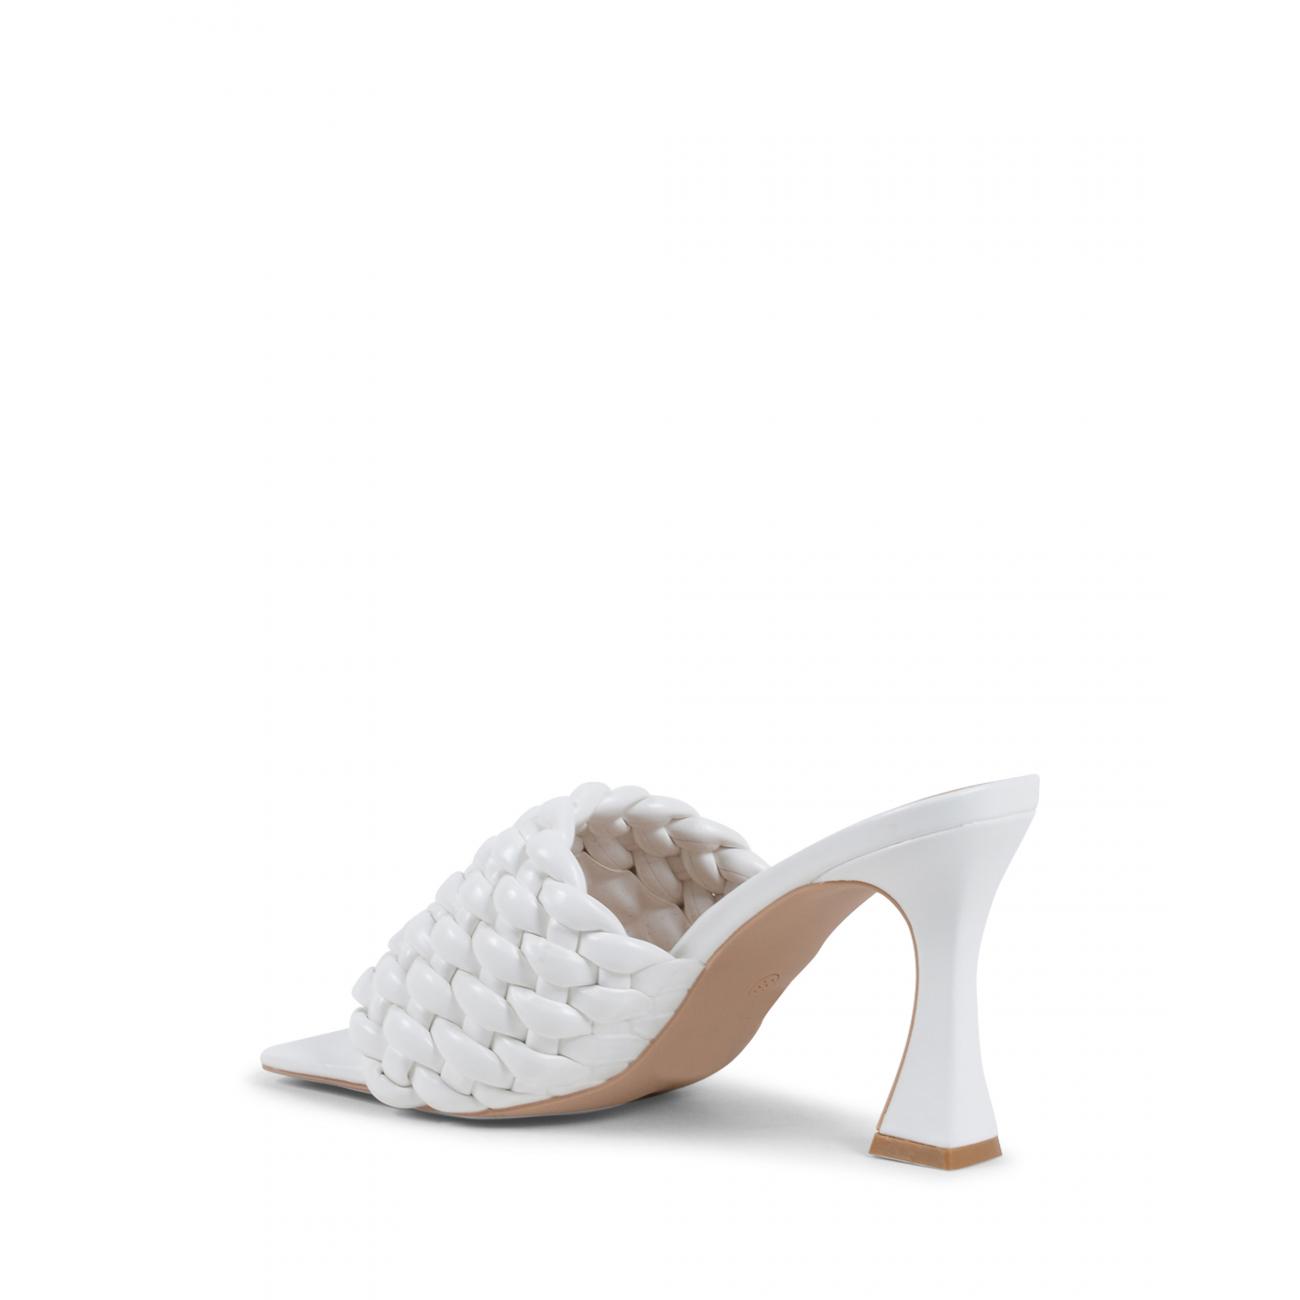 19V69 Italia Women's Mule Sandal White V8185 WHITE